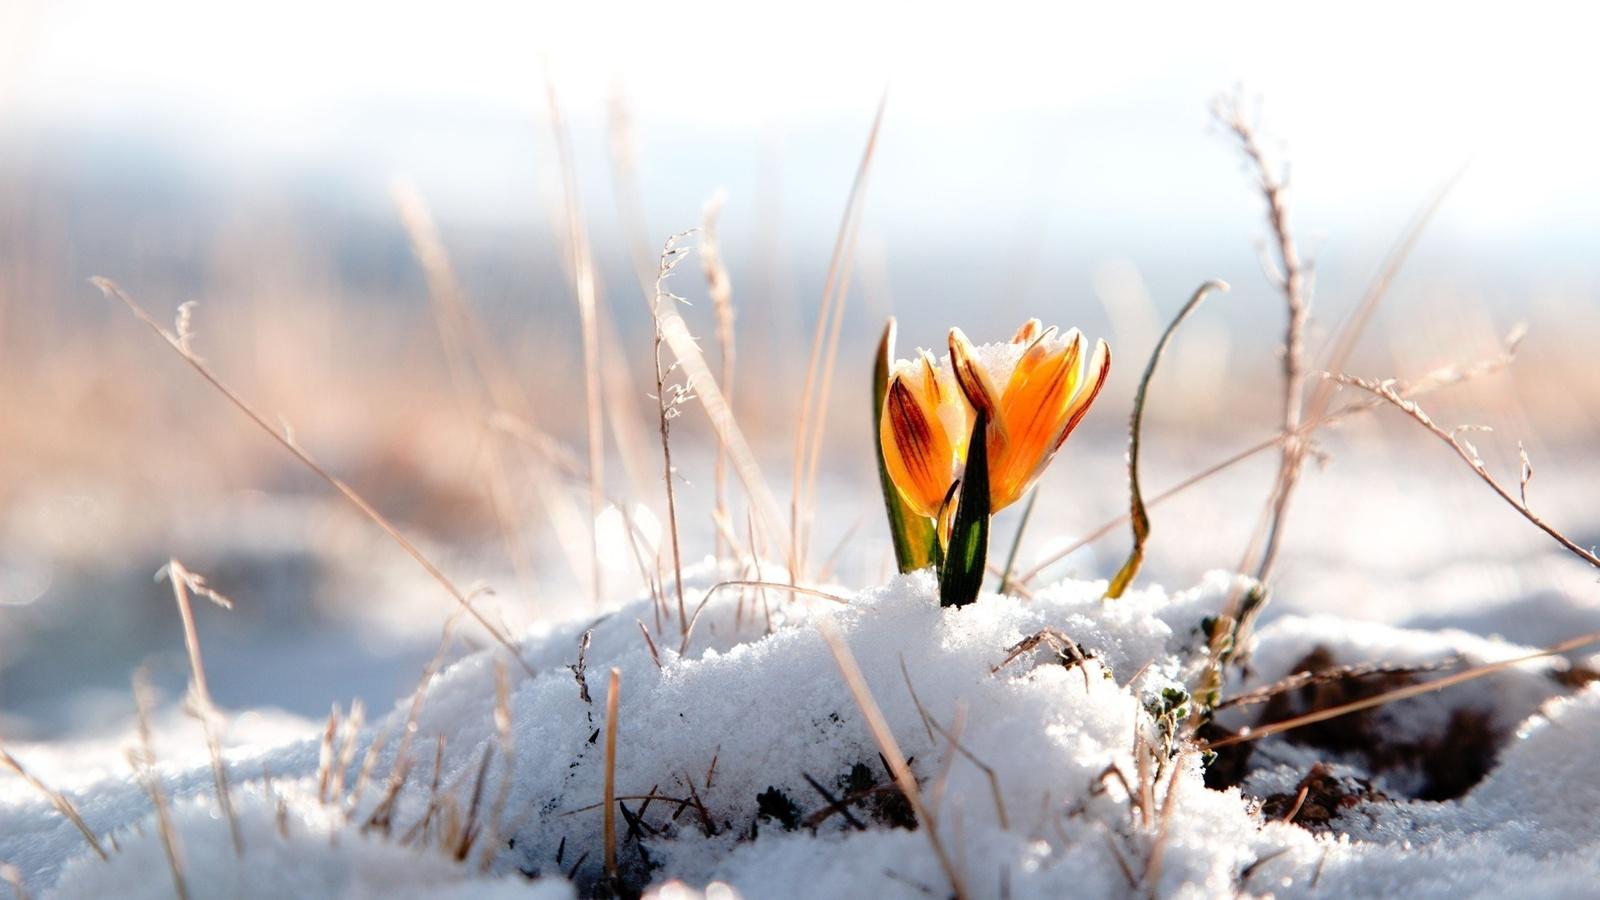 Картинки грибниках, картинки снежное утро весной